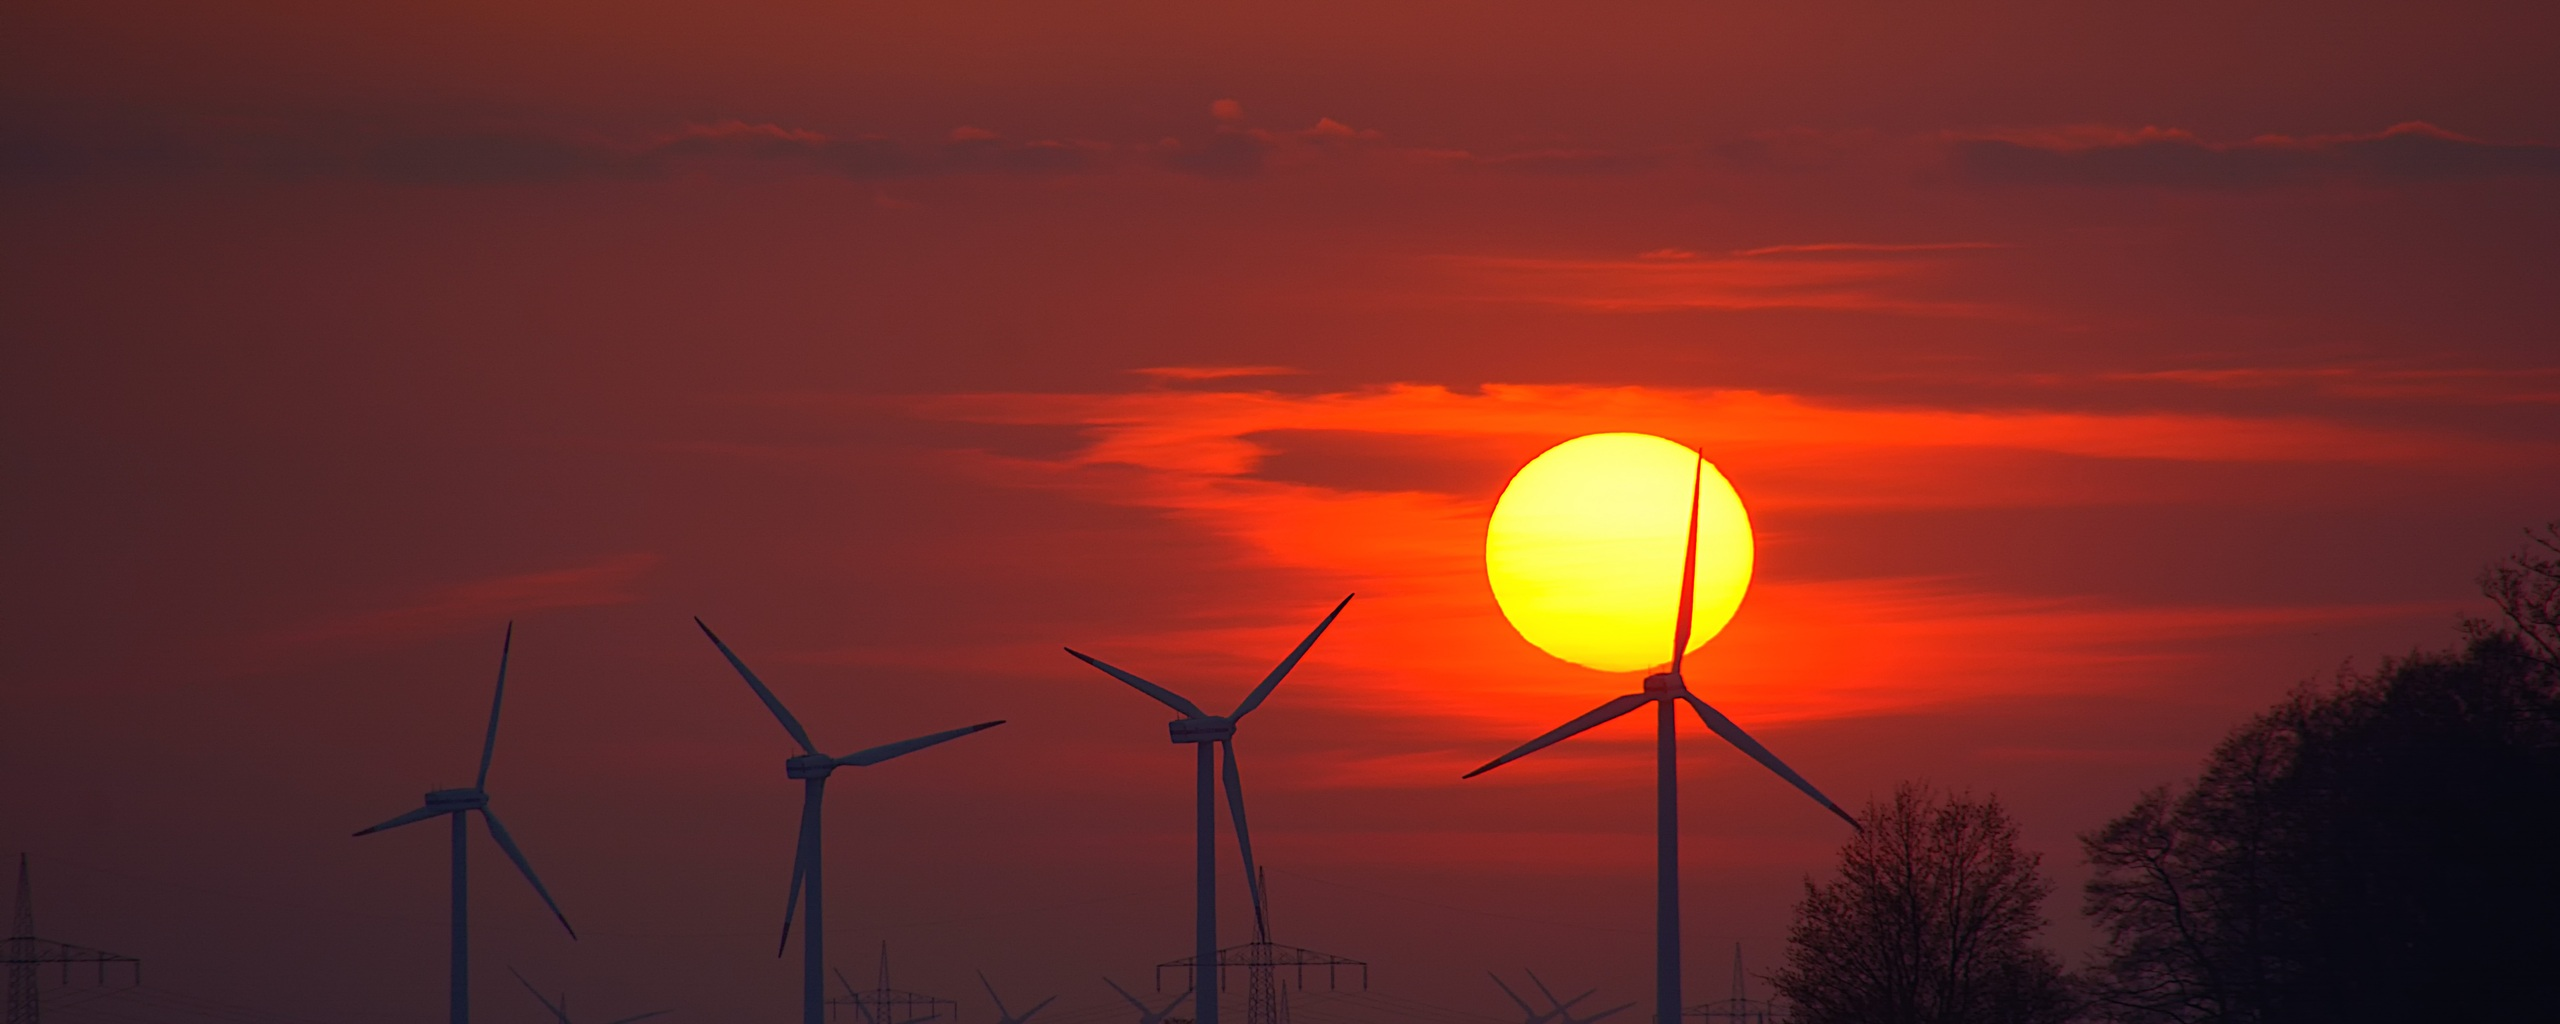 wind-turbines-evening-sunlight-energy-sunset-dg.jpg